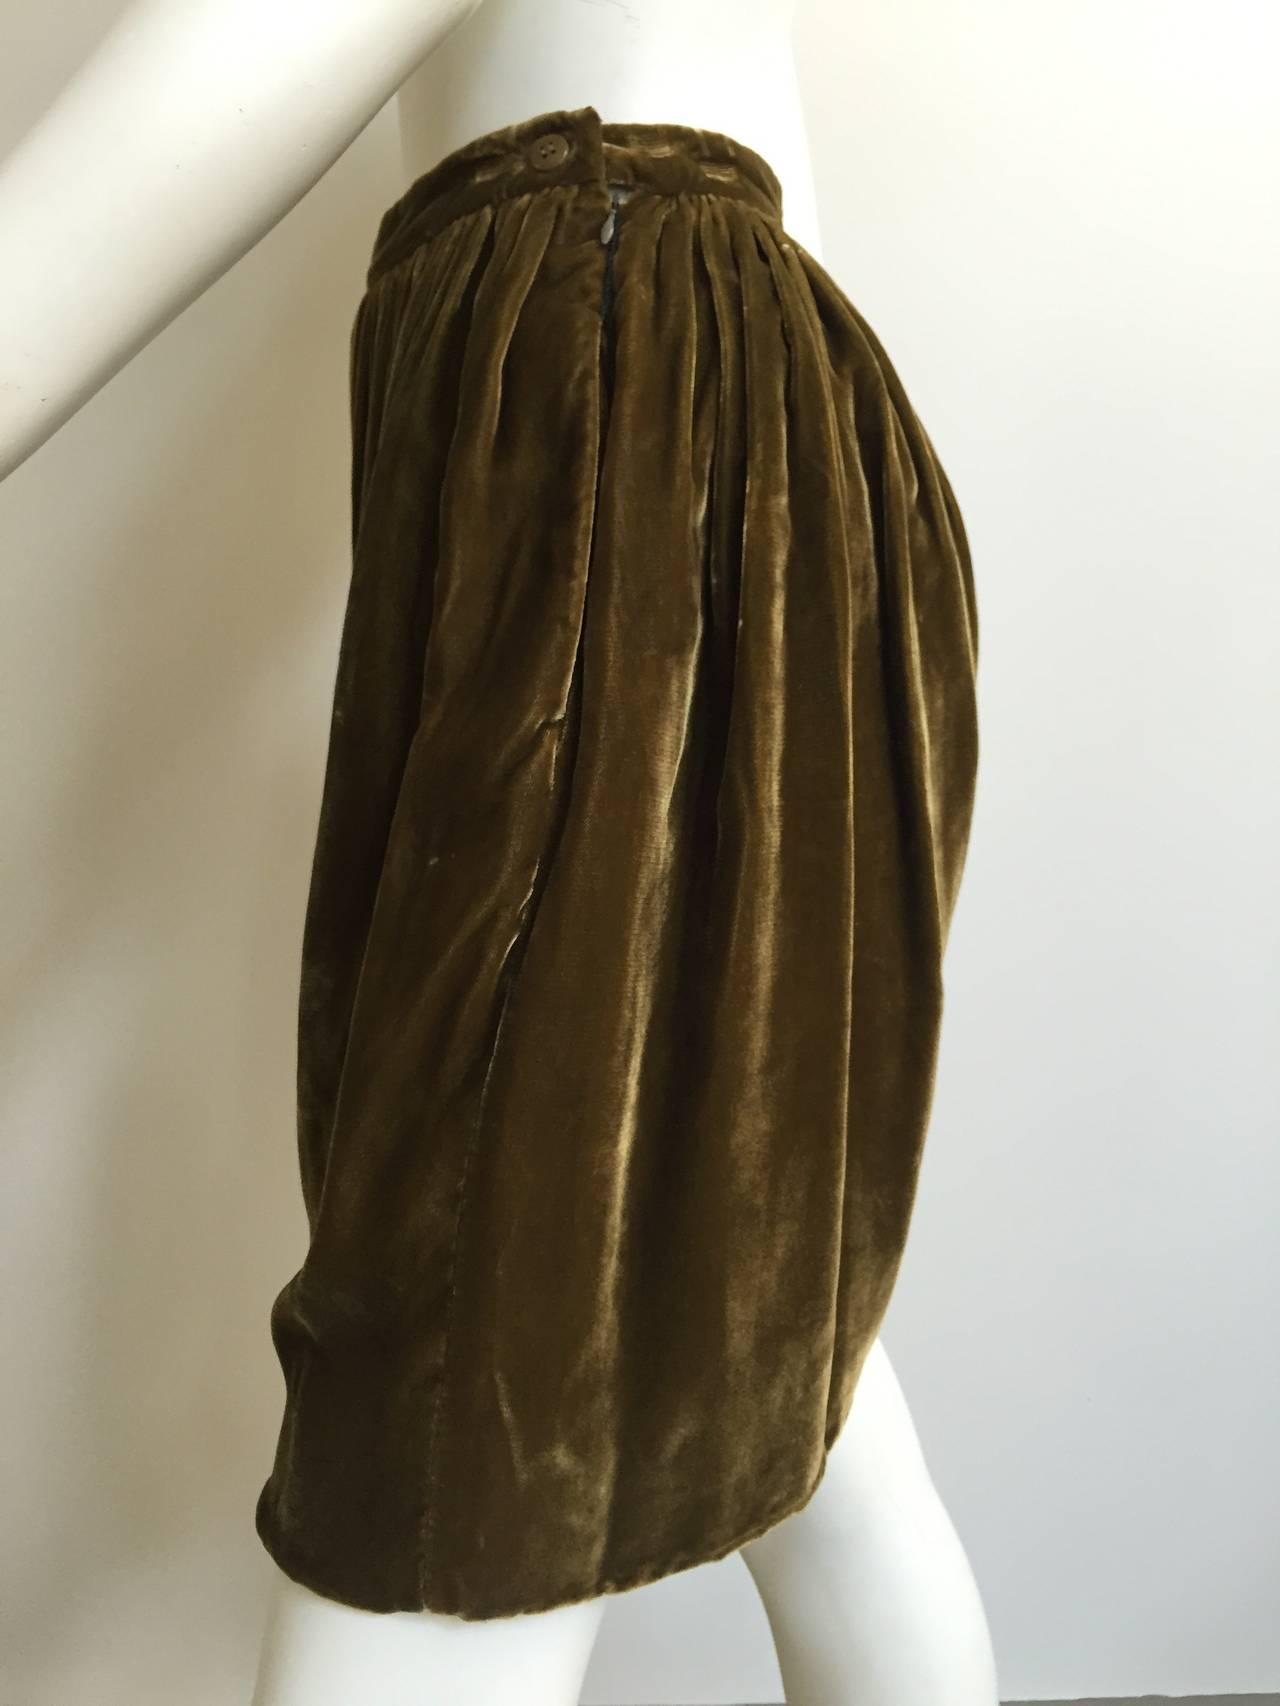 Giorgio Armani Velvet Bloomers Size 4. 4